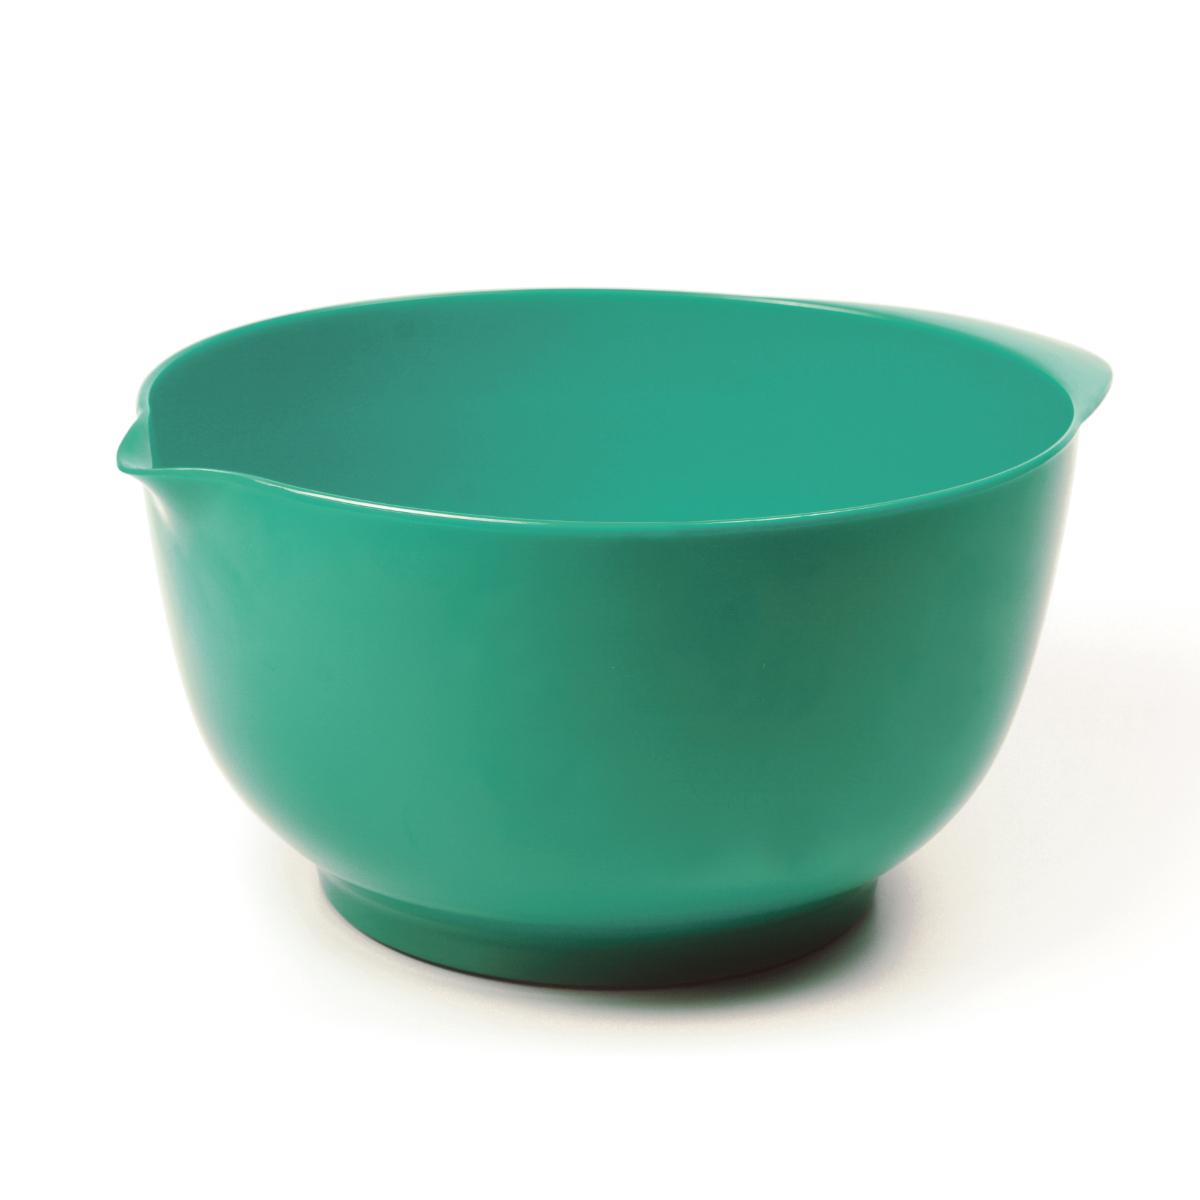 RSVP Turquoise Melamine 4 Quart Mixing Bowl